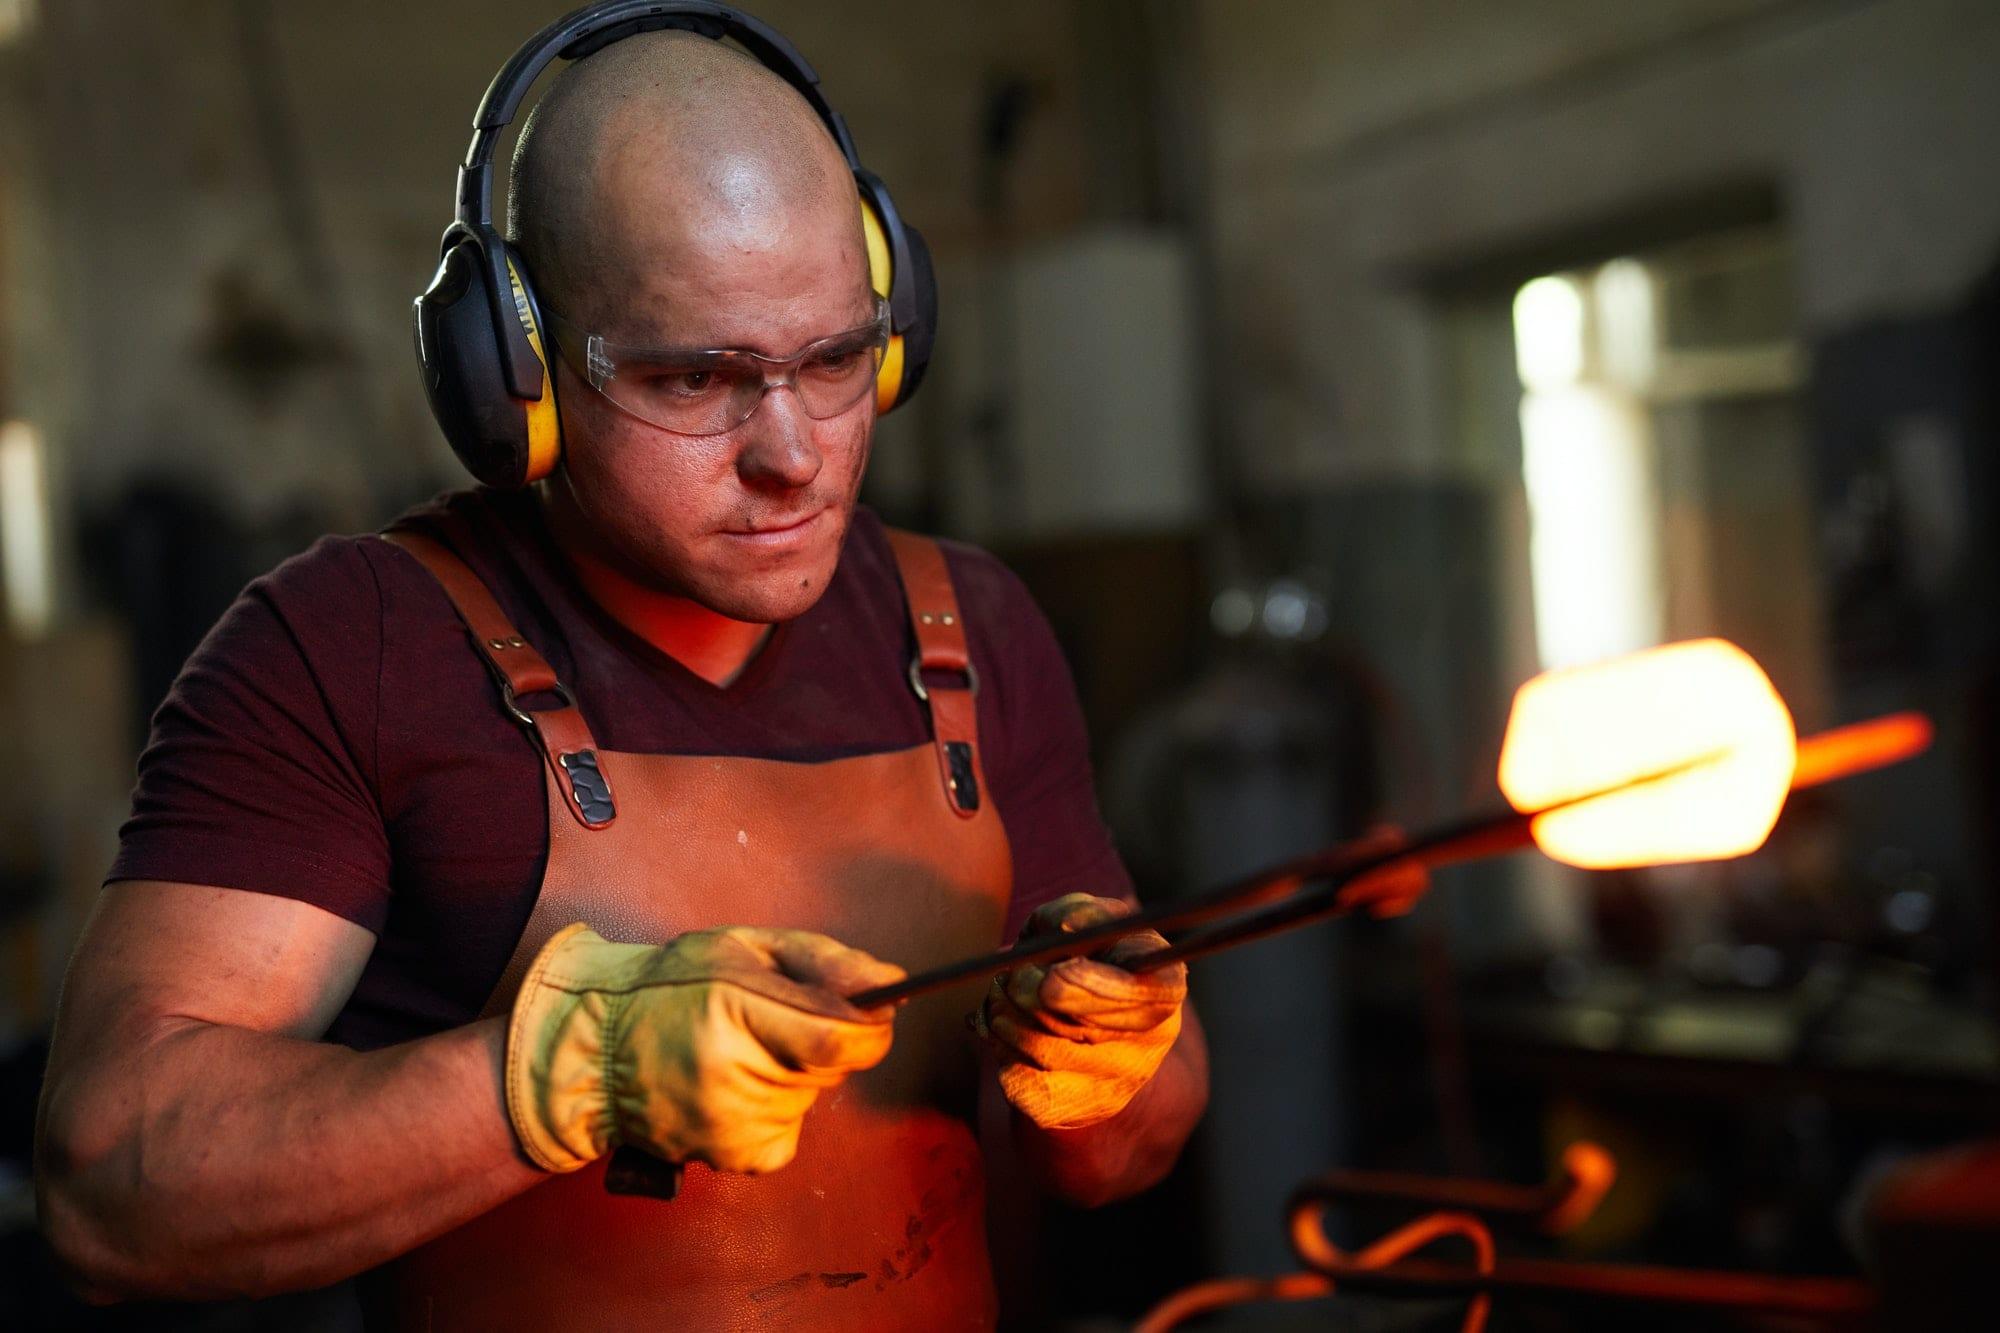 Analyzing shape of heated metal piece